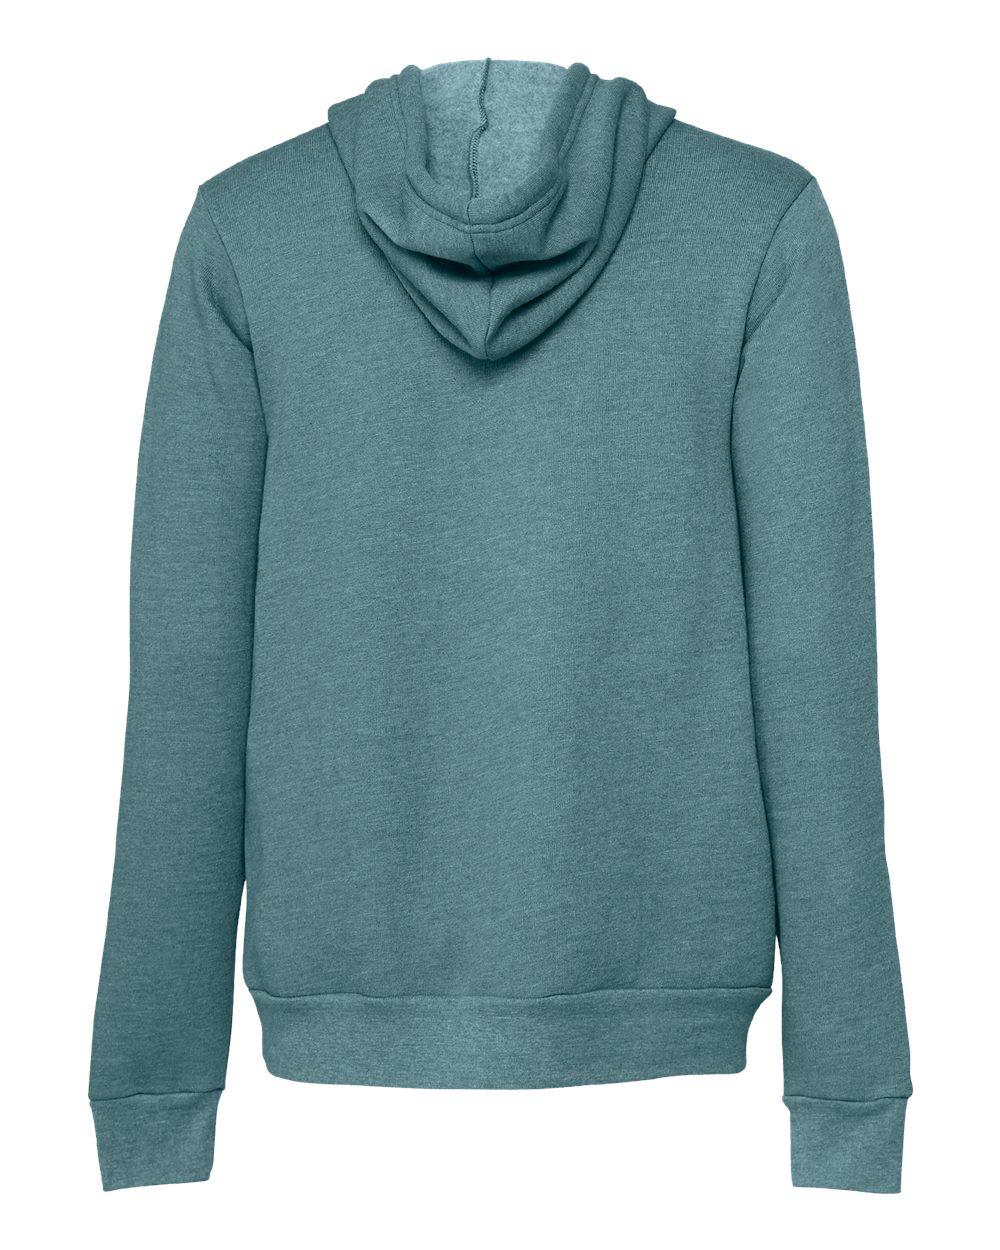 Bella-Canvas-Unisex-Sponge-Hooded-Pullover-Sweatshirt-Blank-3719-up-to-2XL thumbnail 42